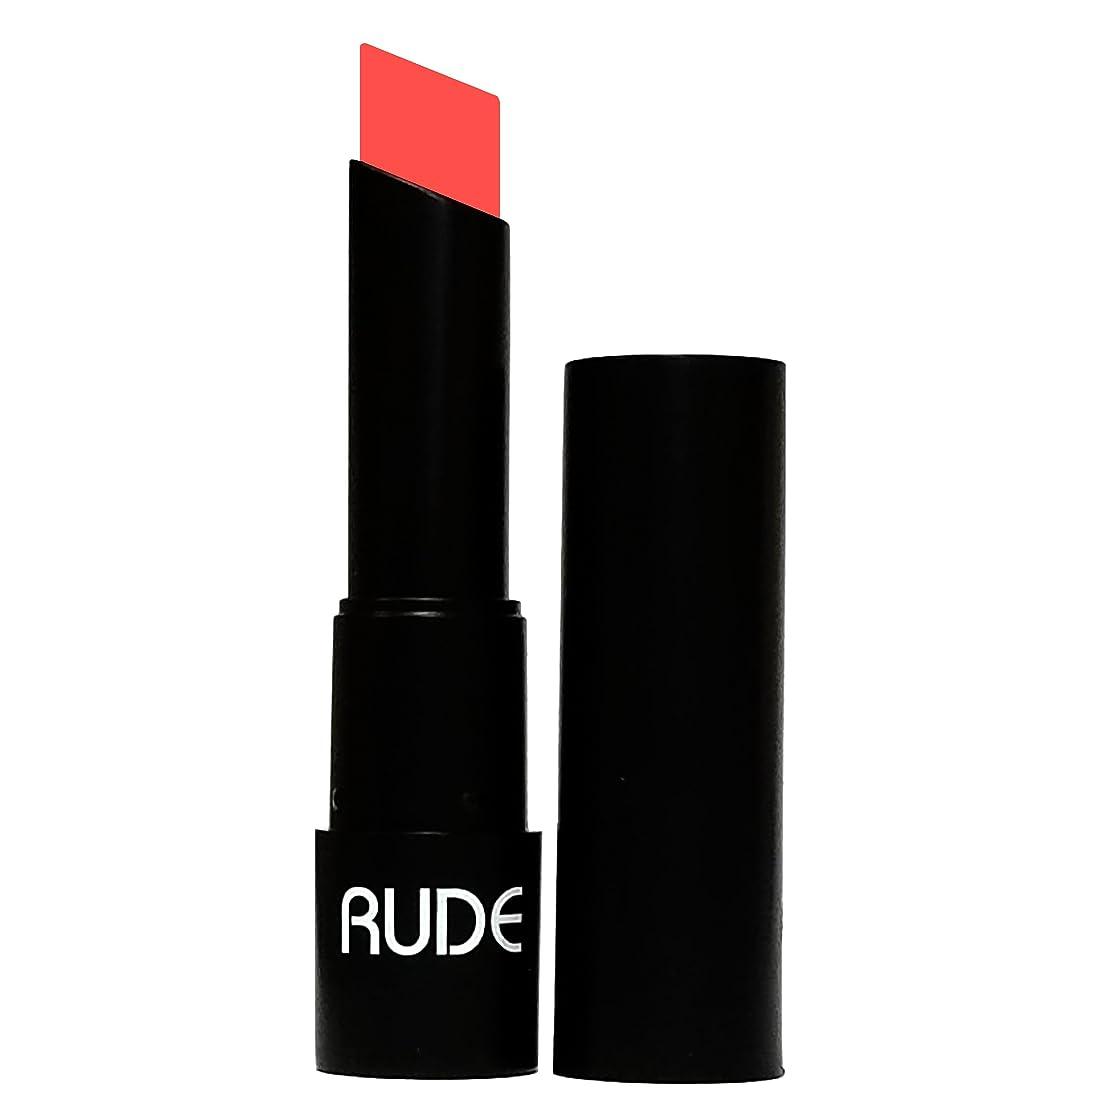 硬さ病気実用的(3 Pack) RUDE Attitude Matte Lipstick - Pompous (並行輸入品)